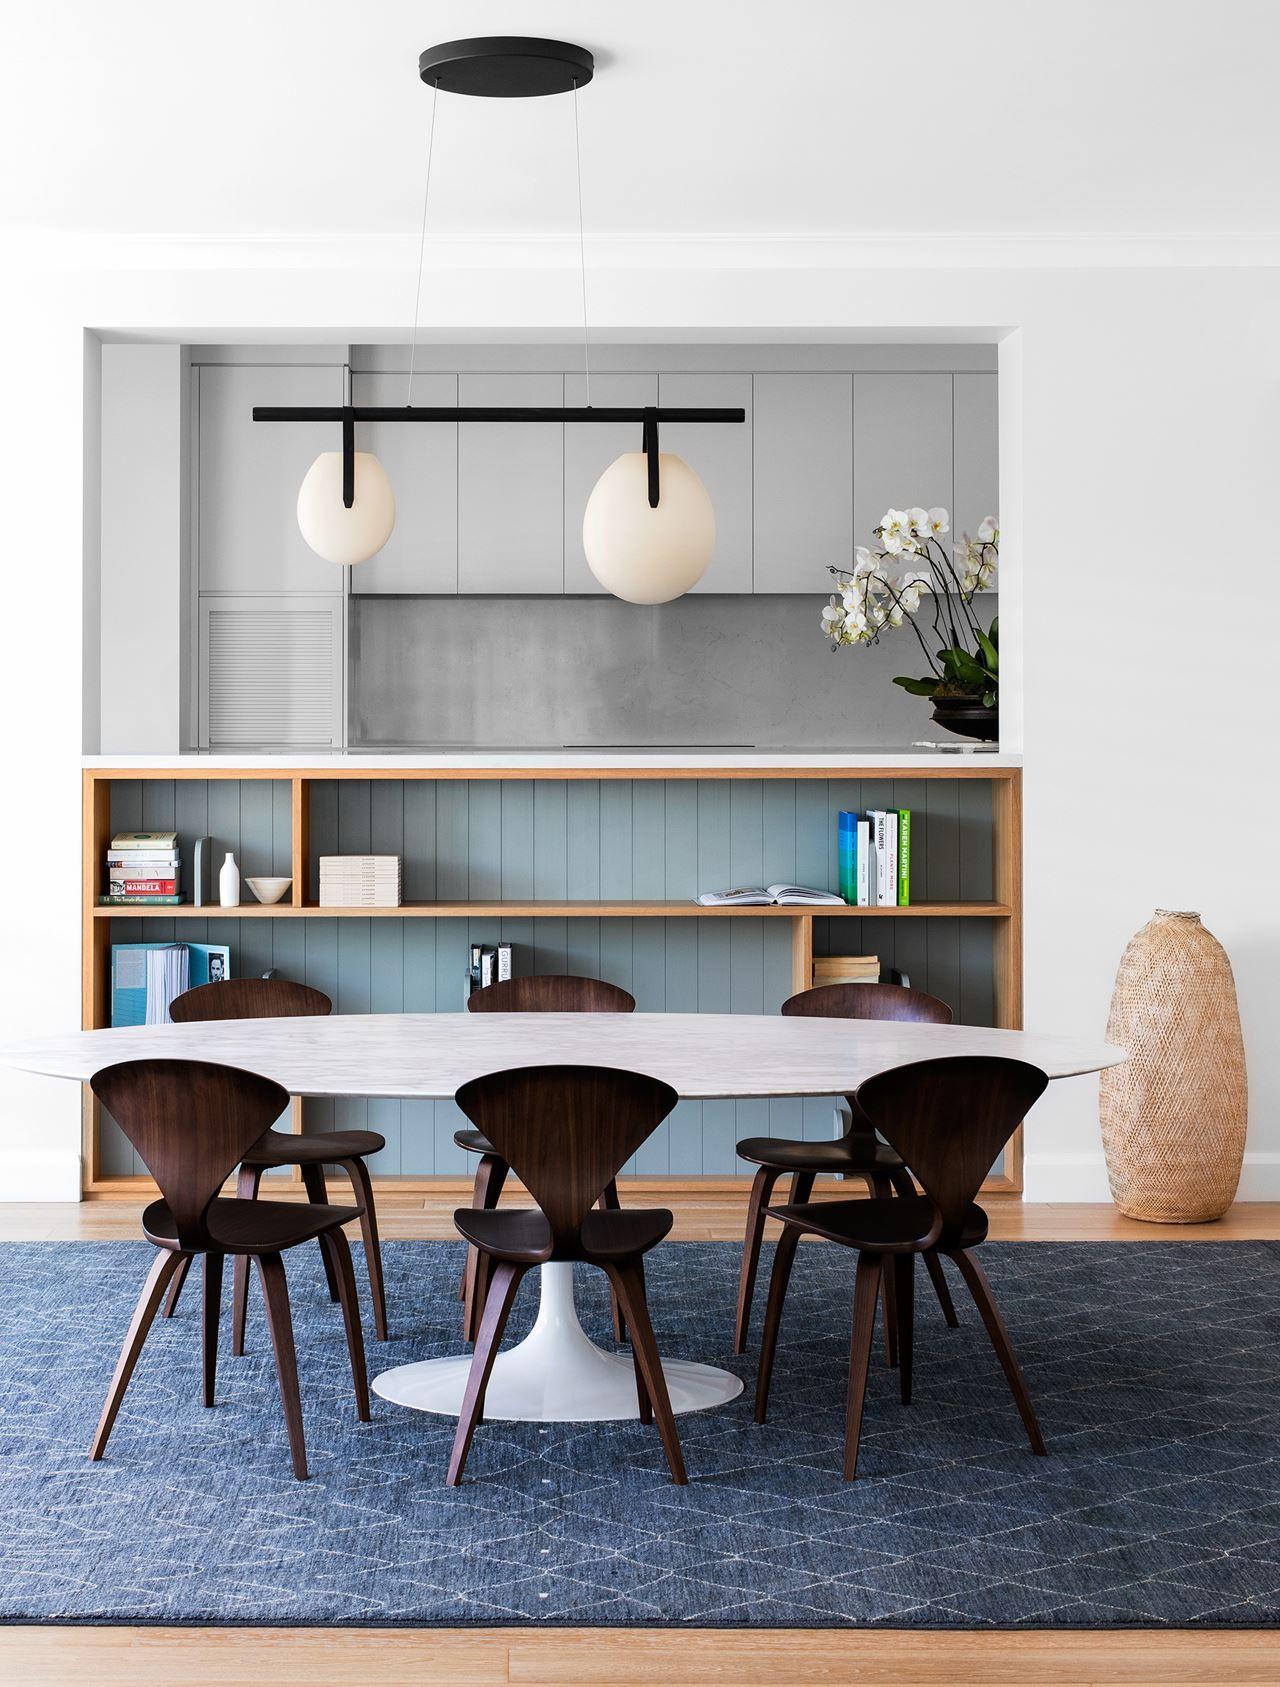 cherner furniture. Dining Area Has An Eero Saarinen \u0027Ellipse\u0027 Table And Cherner Chairs From [De Furniture